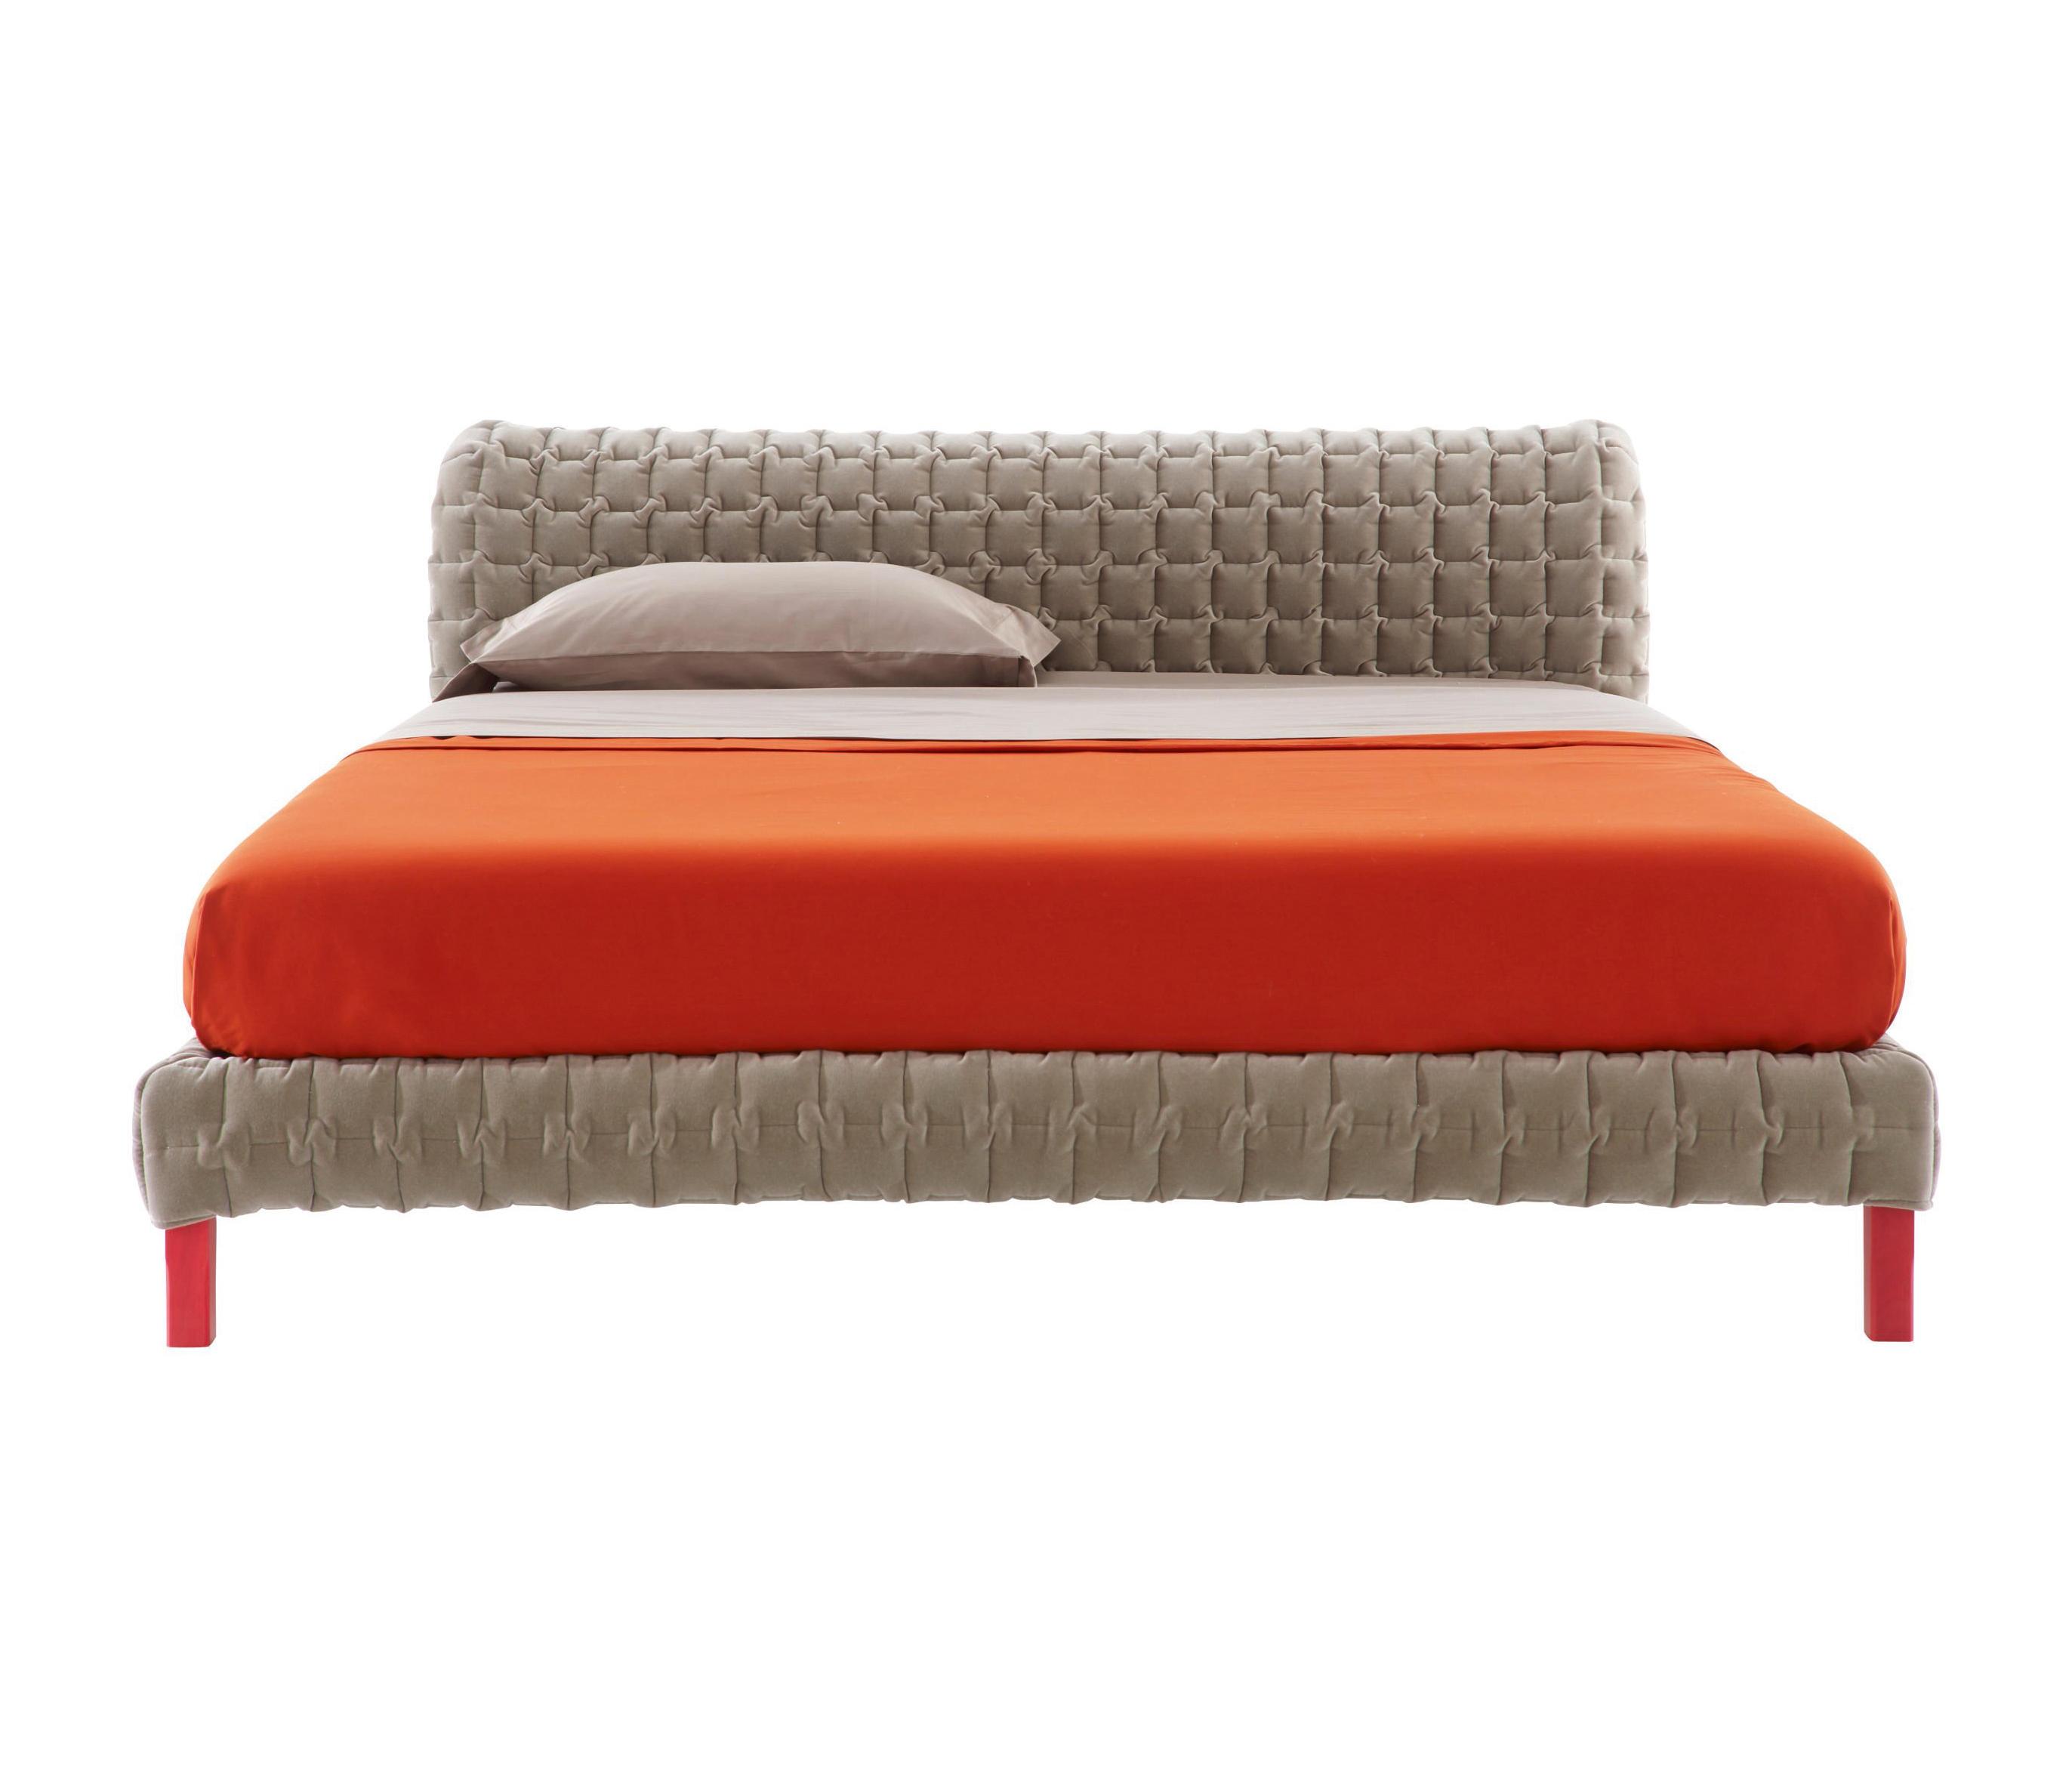 kopfteil bett 200 excellent bett ohne kopfteil x singulr betten ohne kopfteil bett ohne. Black Bedroom Furniture Sets. Home Design Ideas